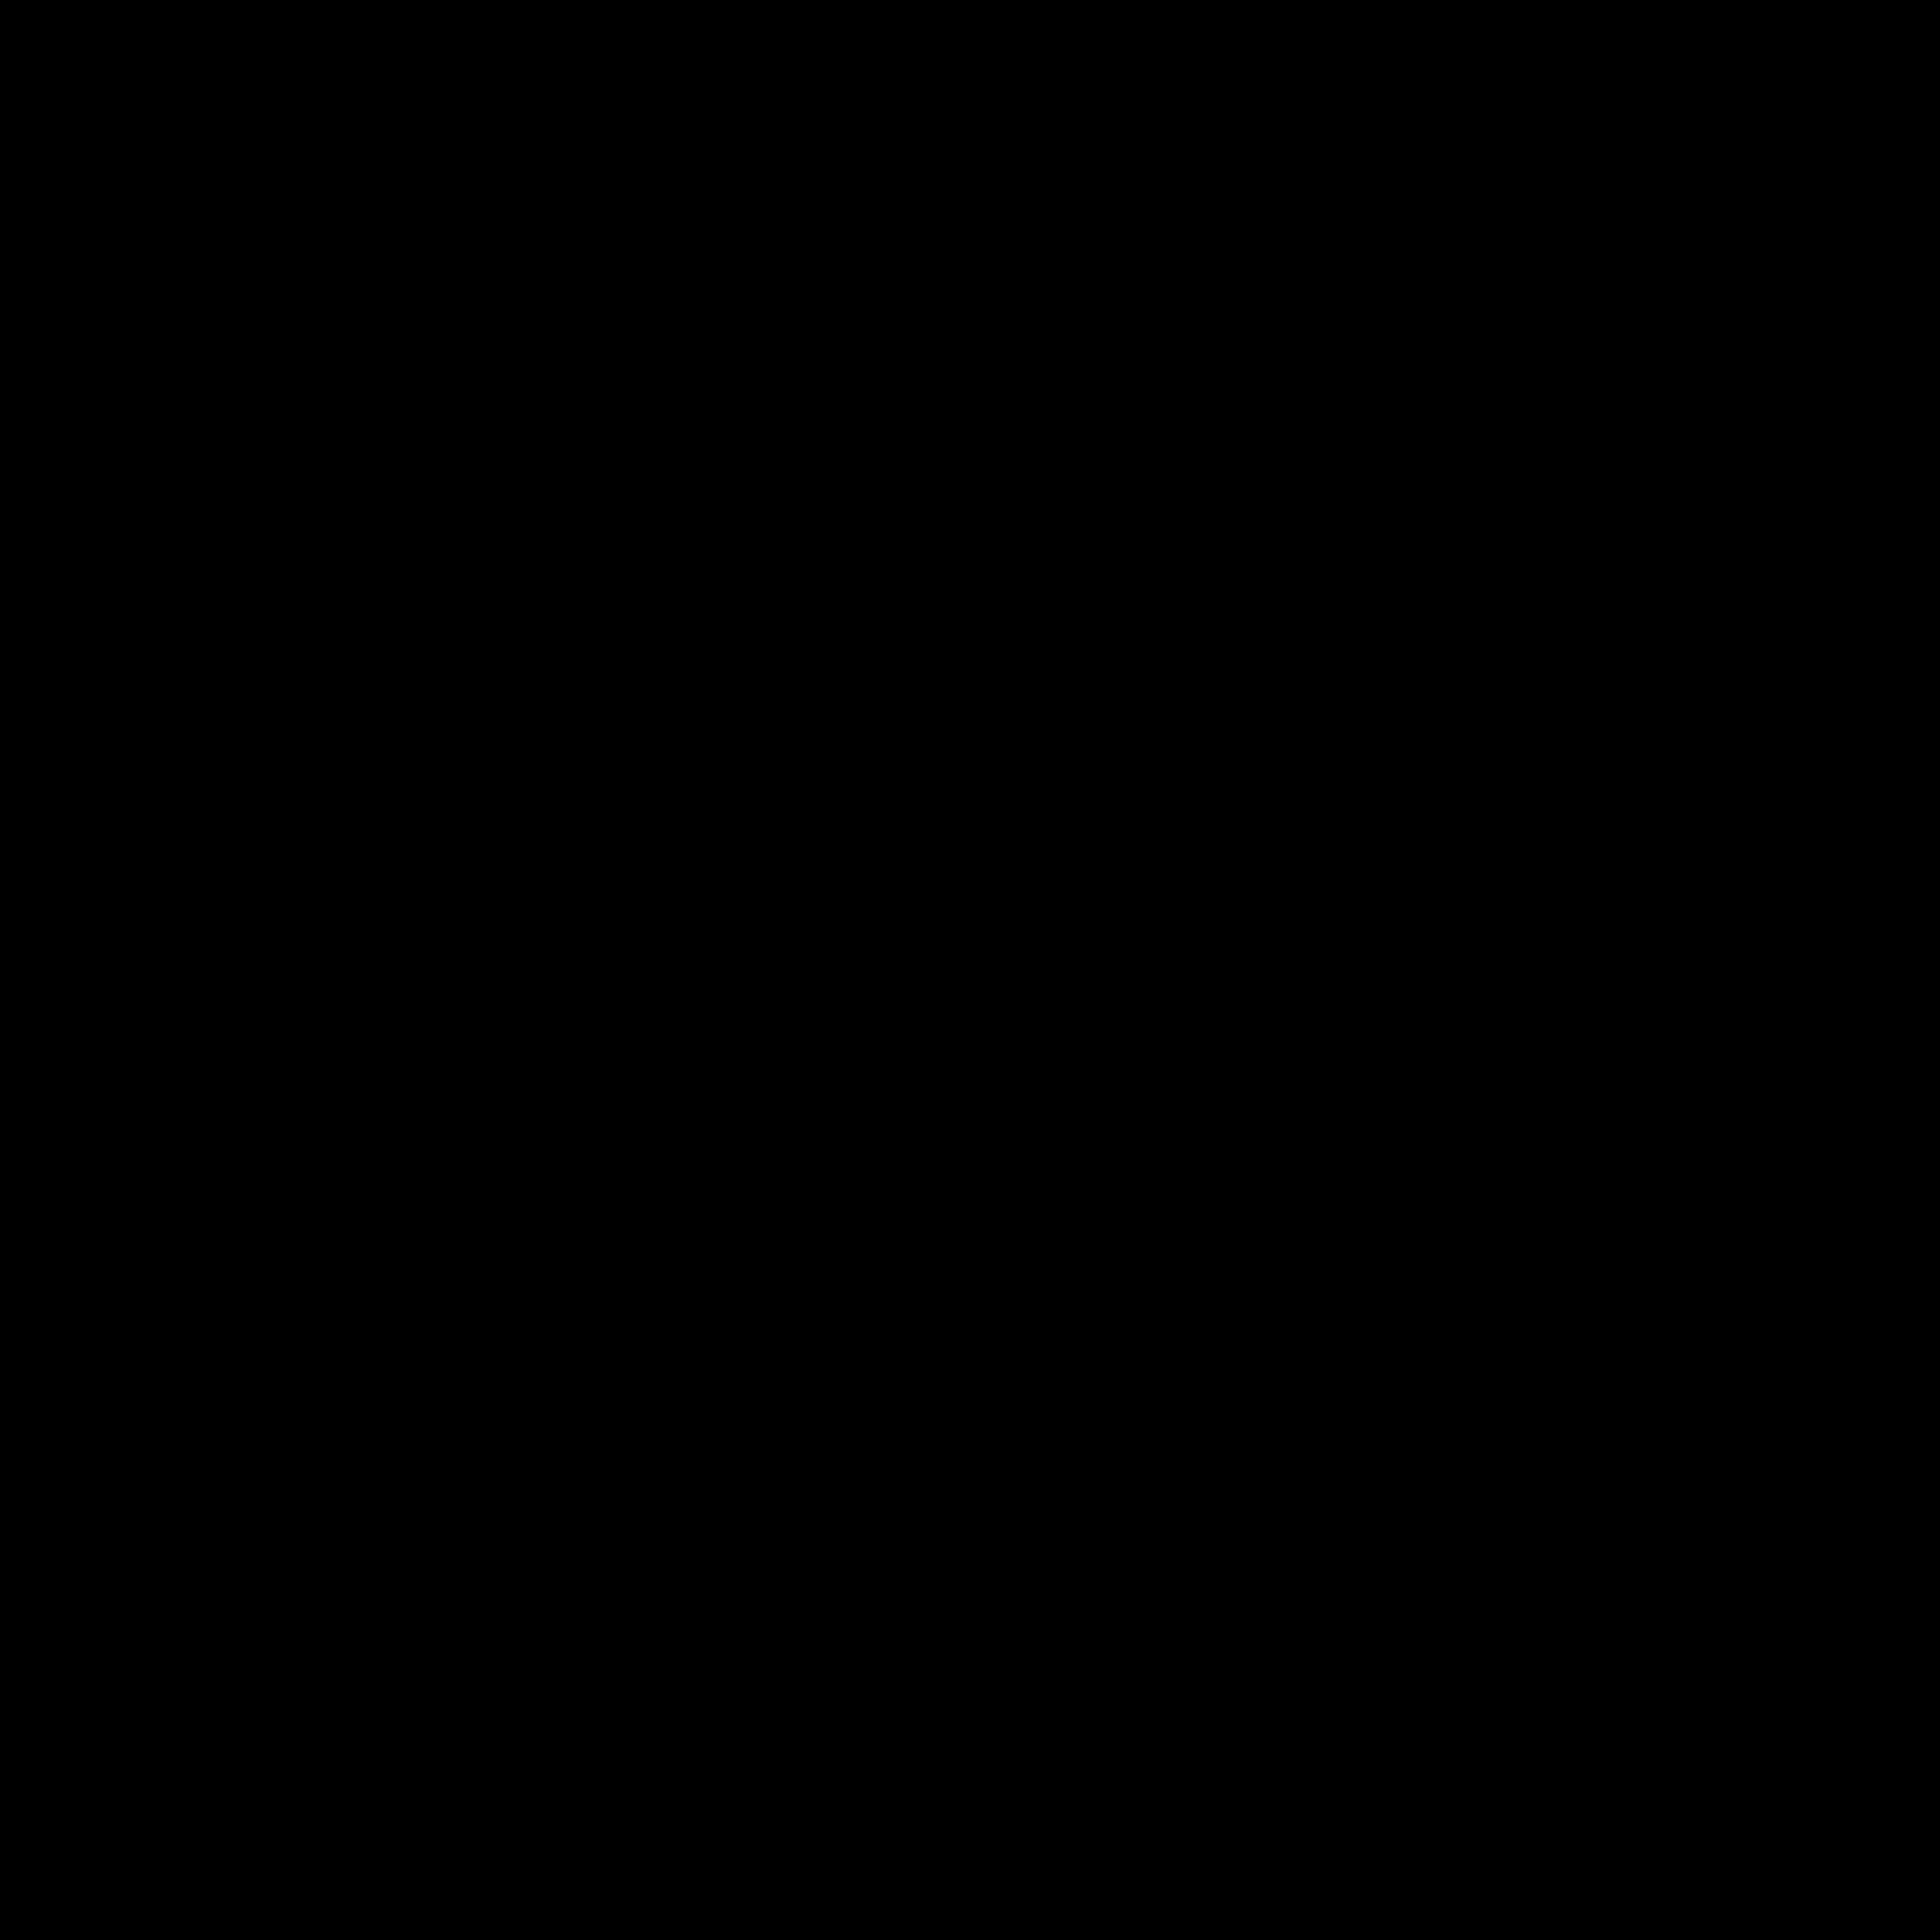 laravel, black icon